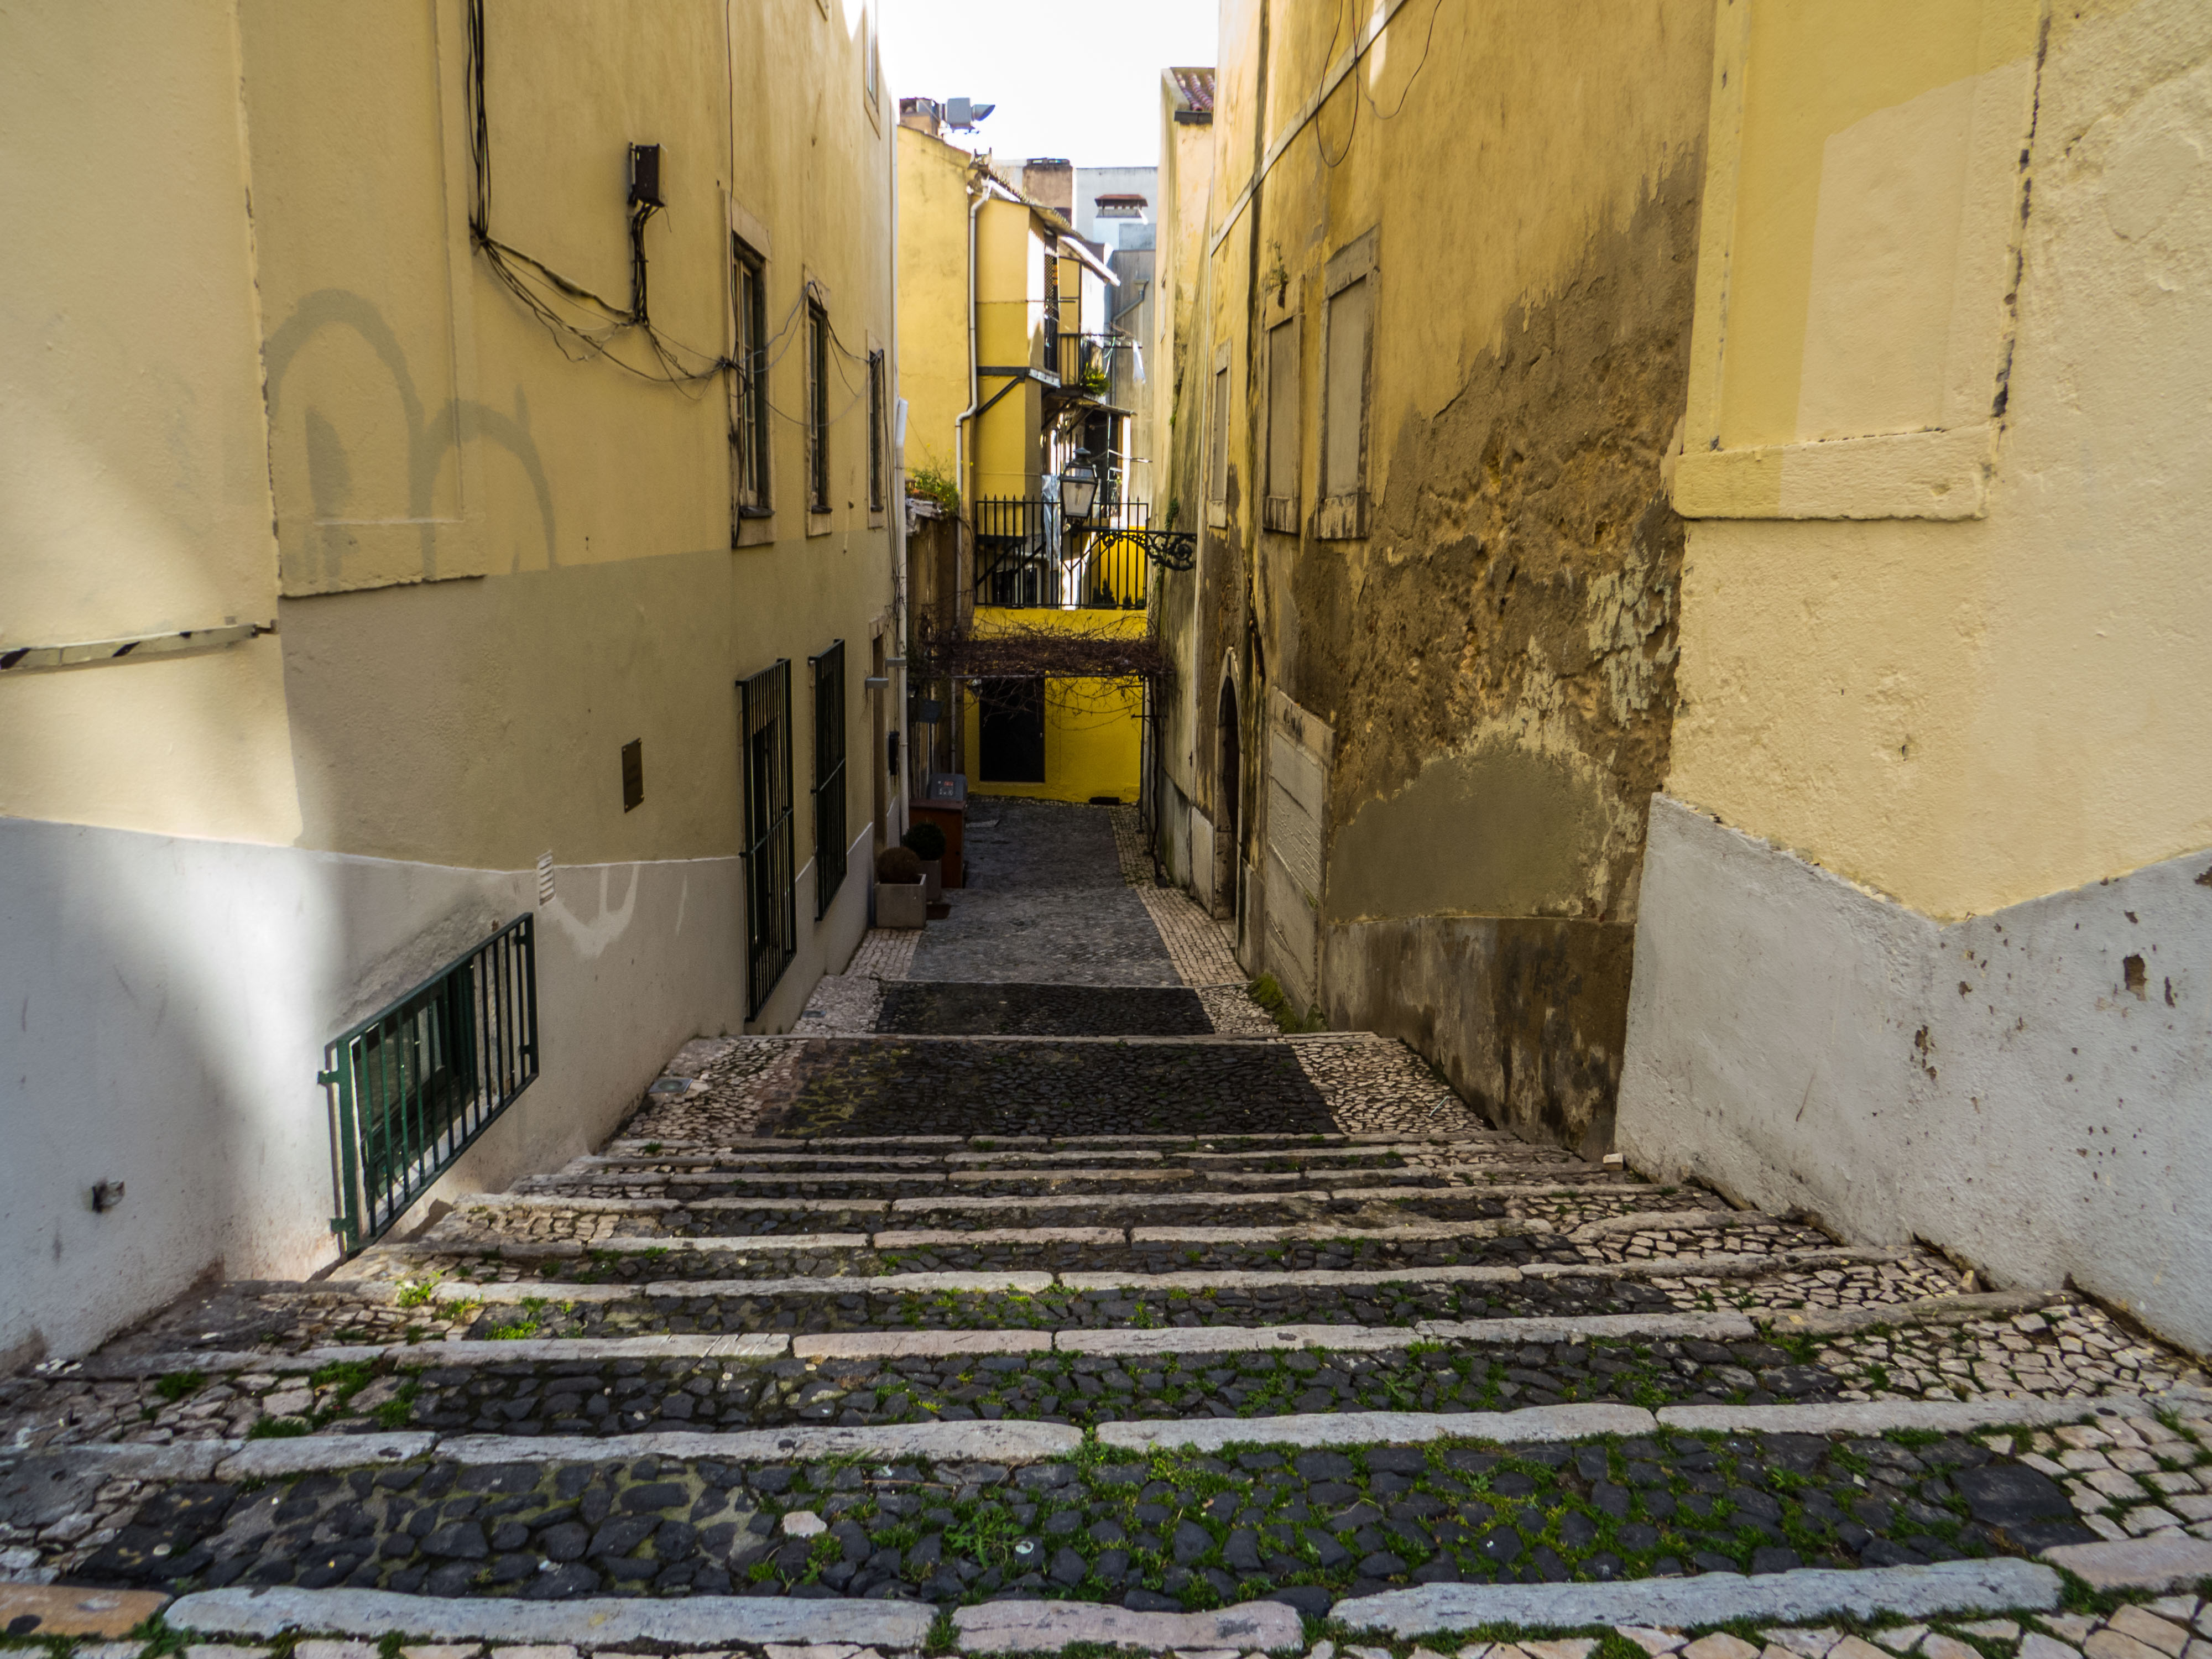 Narrow street of Lisbon, Portugal, Pavement, Romantic, Street, HQ Photo